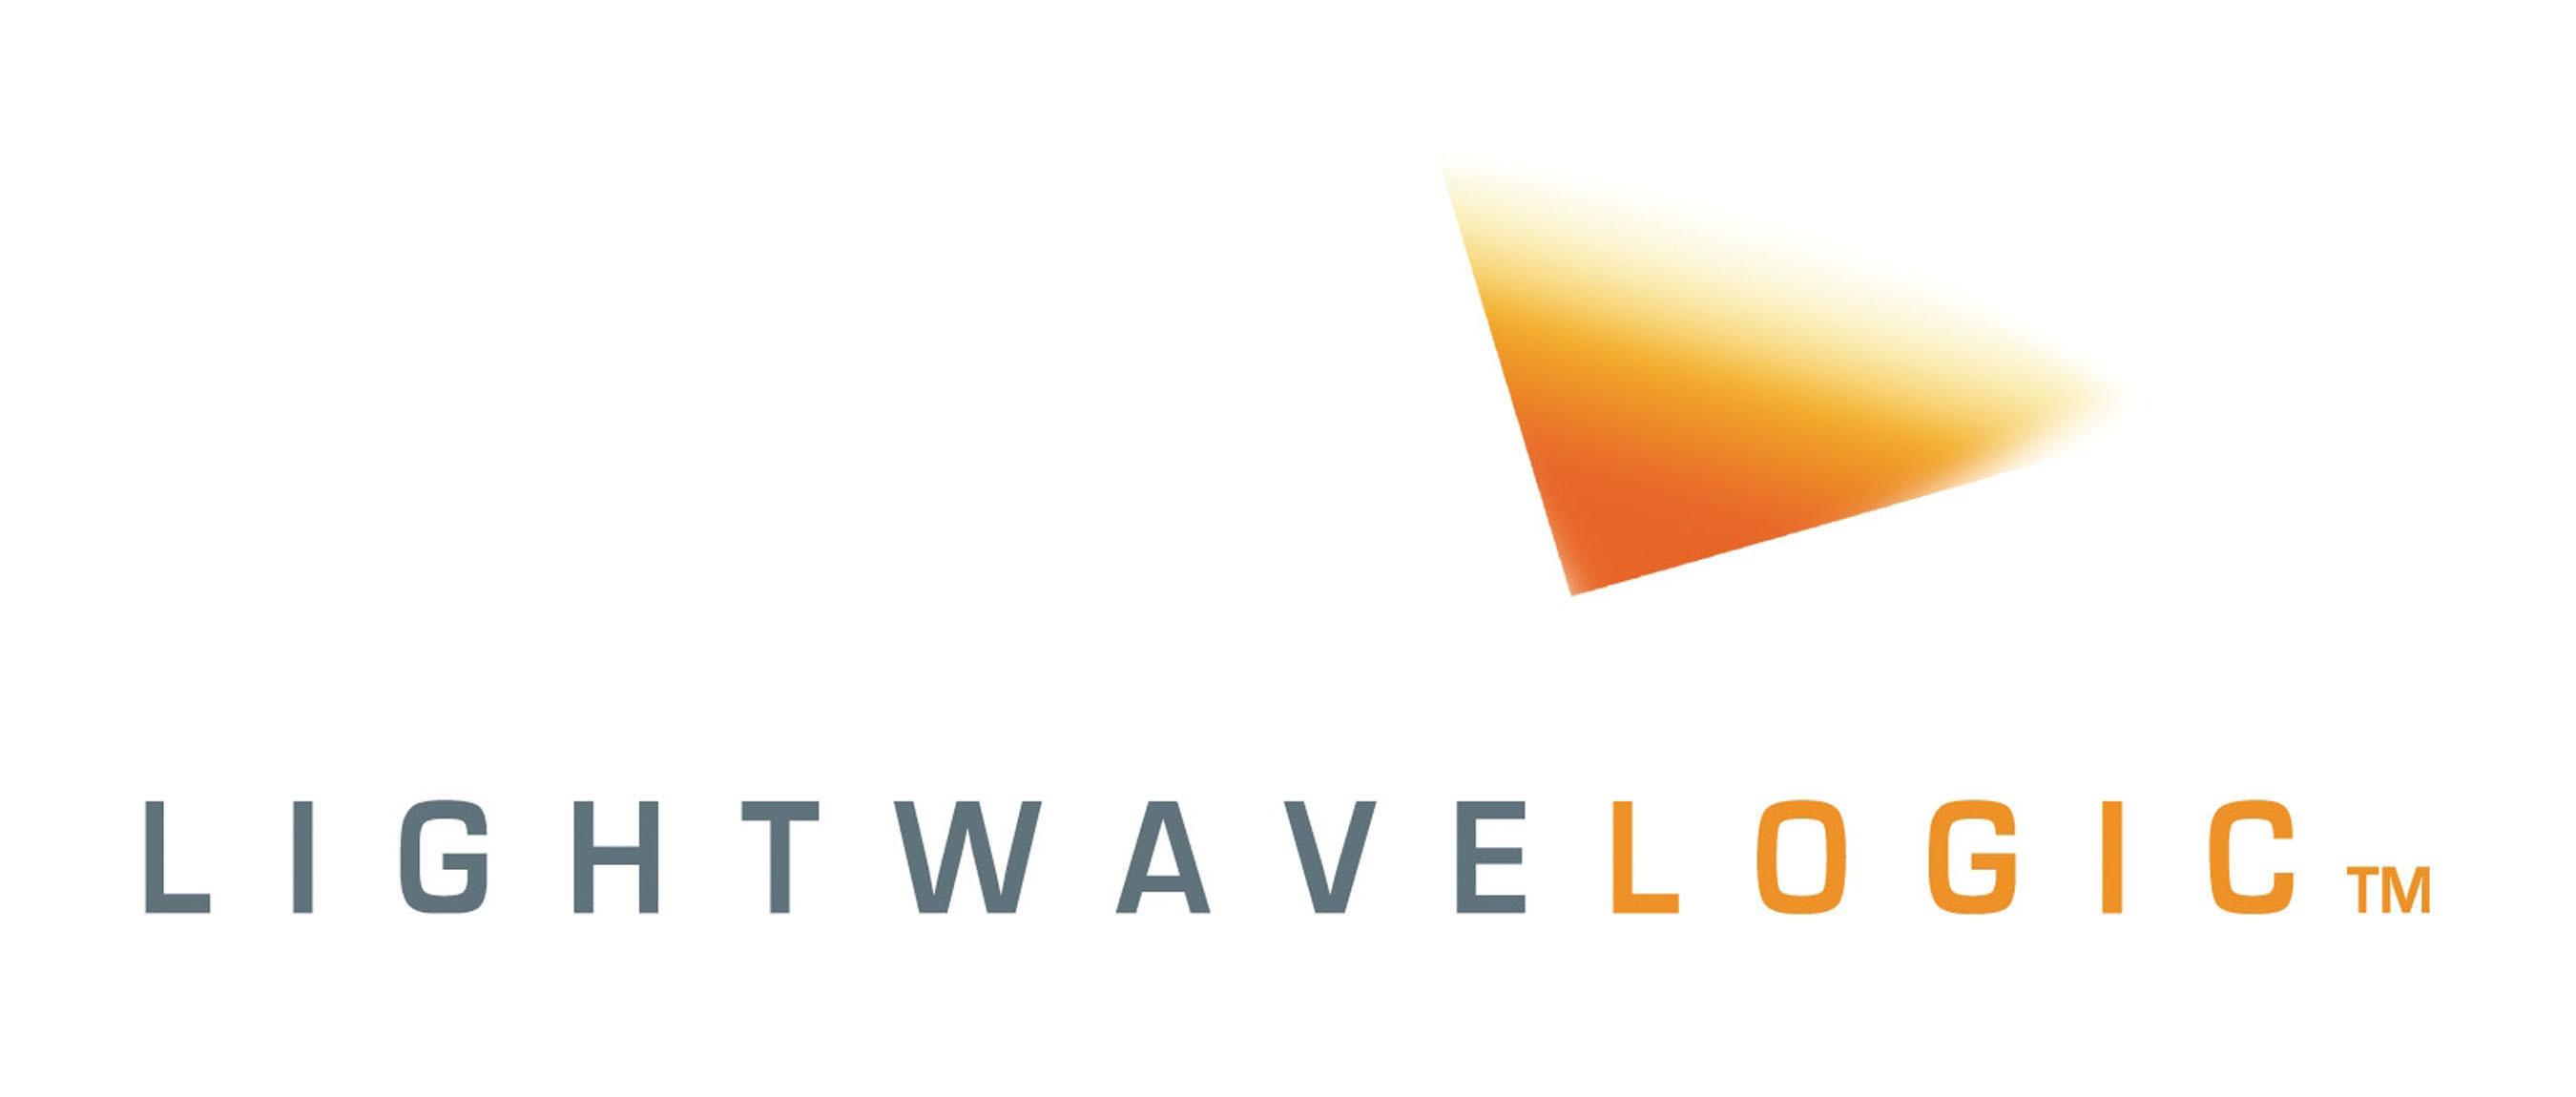 Lightwave Logic Logo